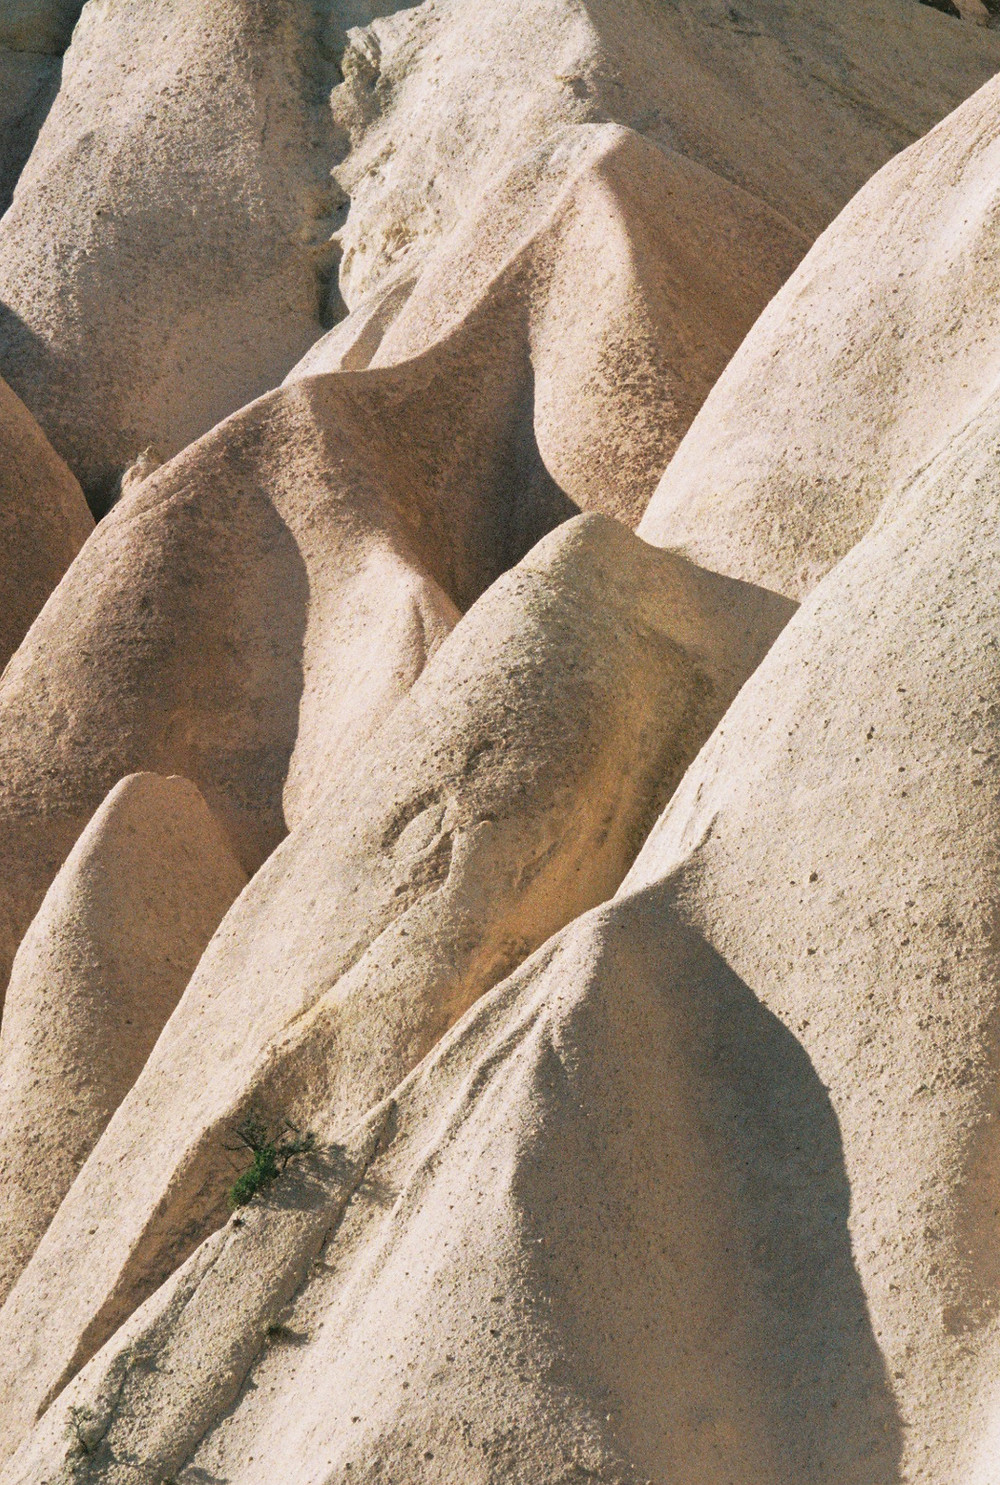    Studio Joko traveled to Turkey to visit Red & Rose Valley, Cappadocia, Turkey